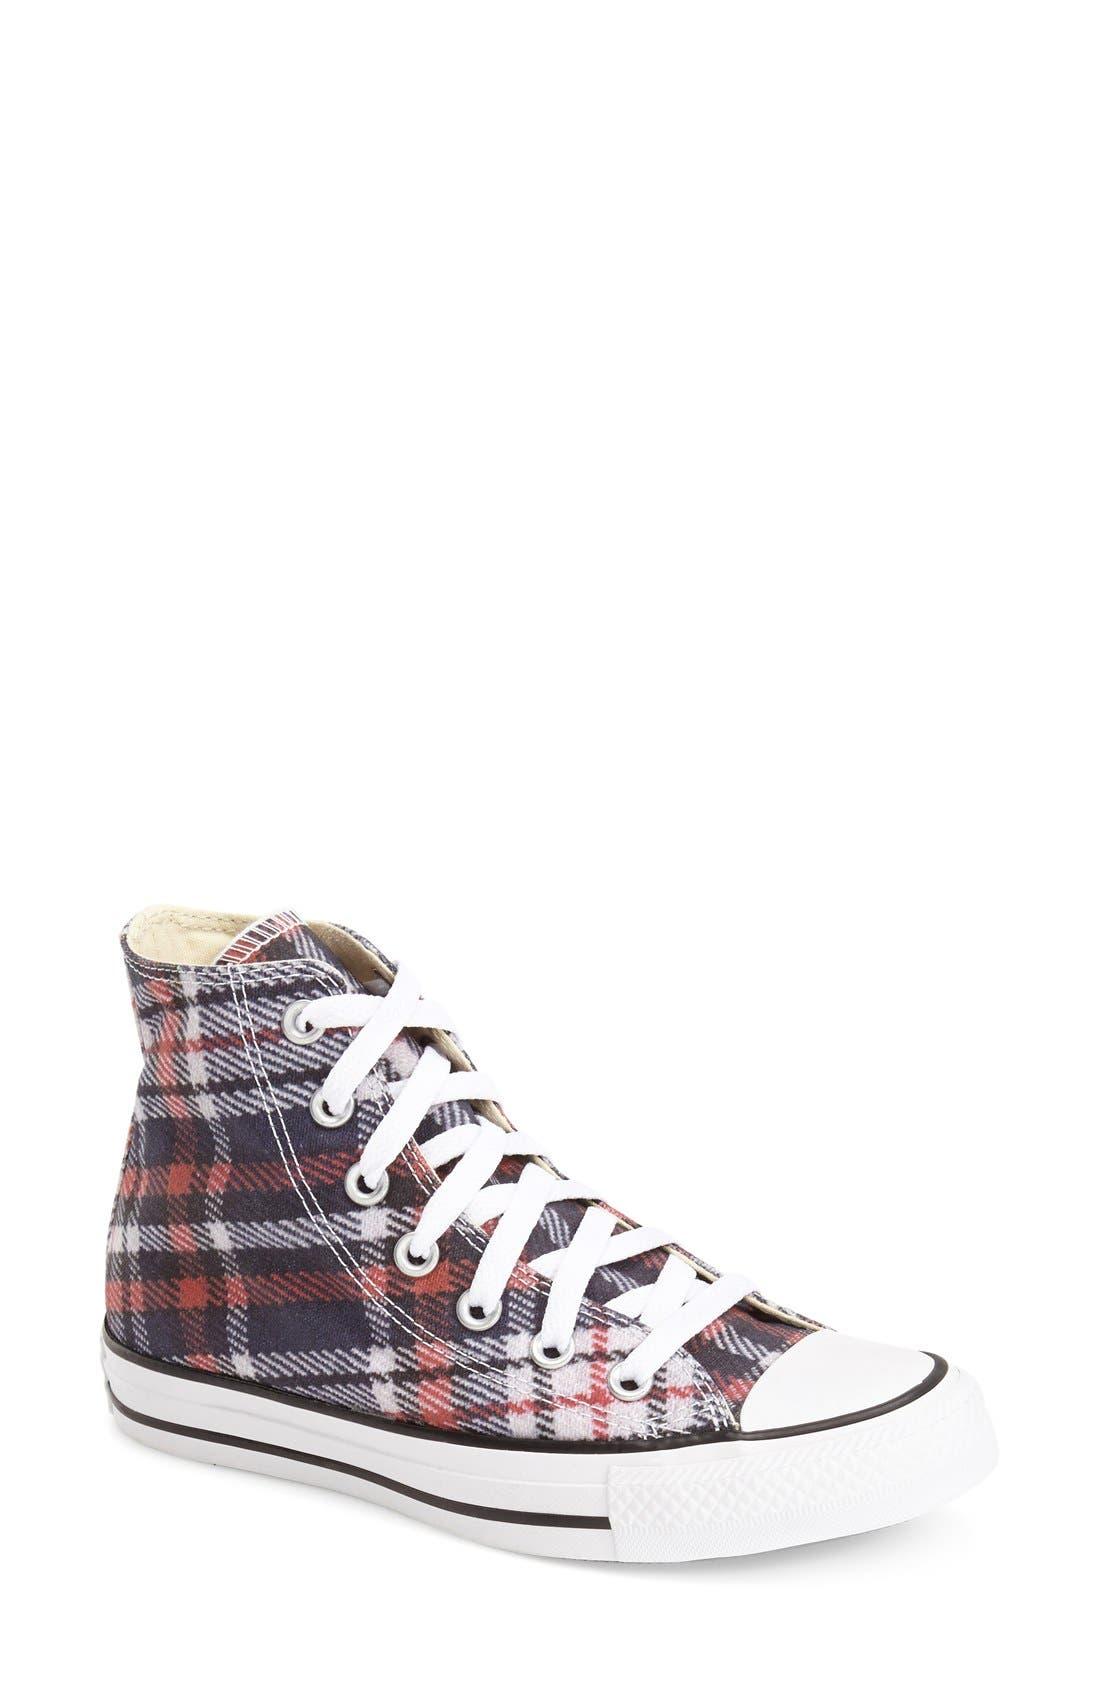 Main Image - Converse Chuck Taylor® All Star® Plaid High Top Sneaker (Women)